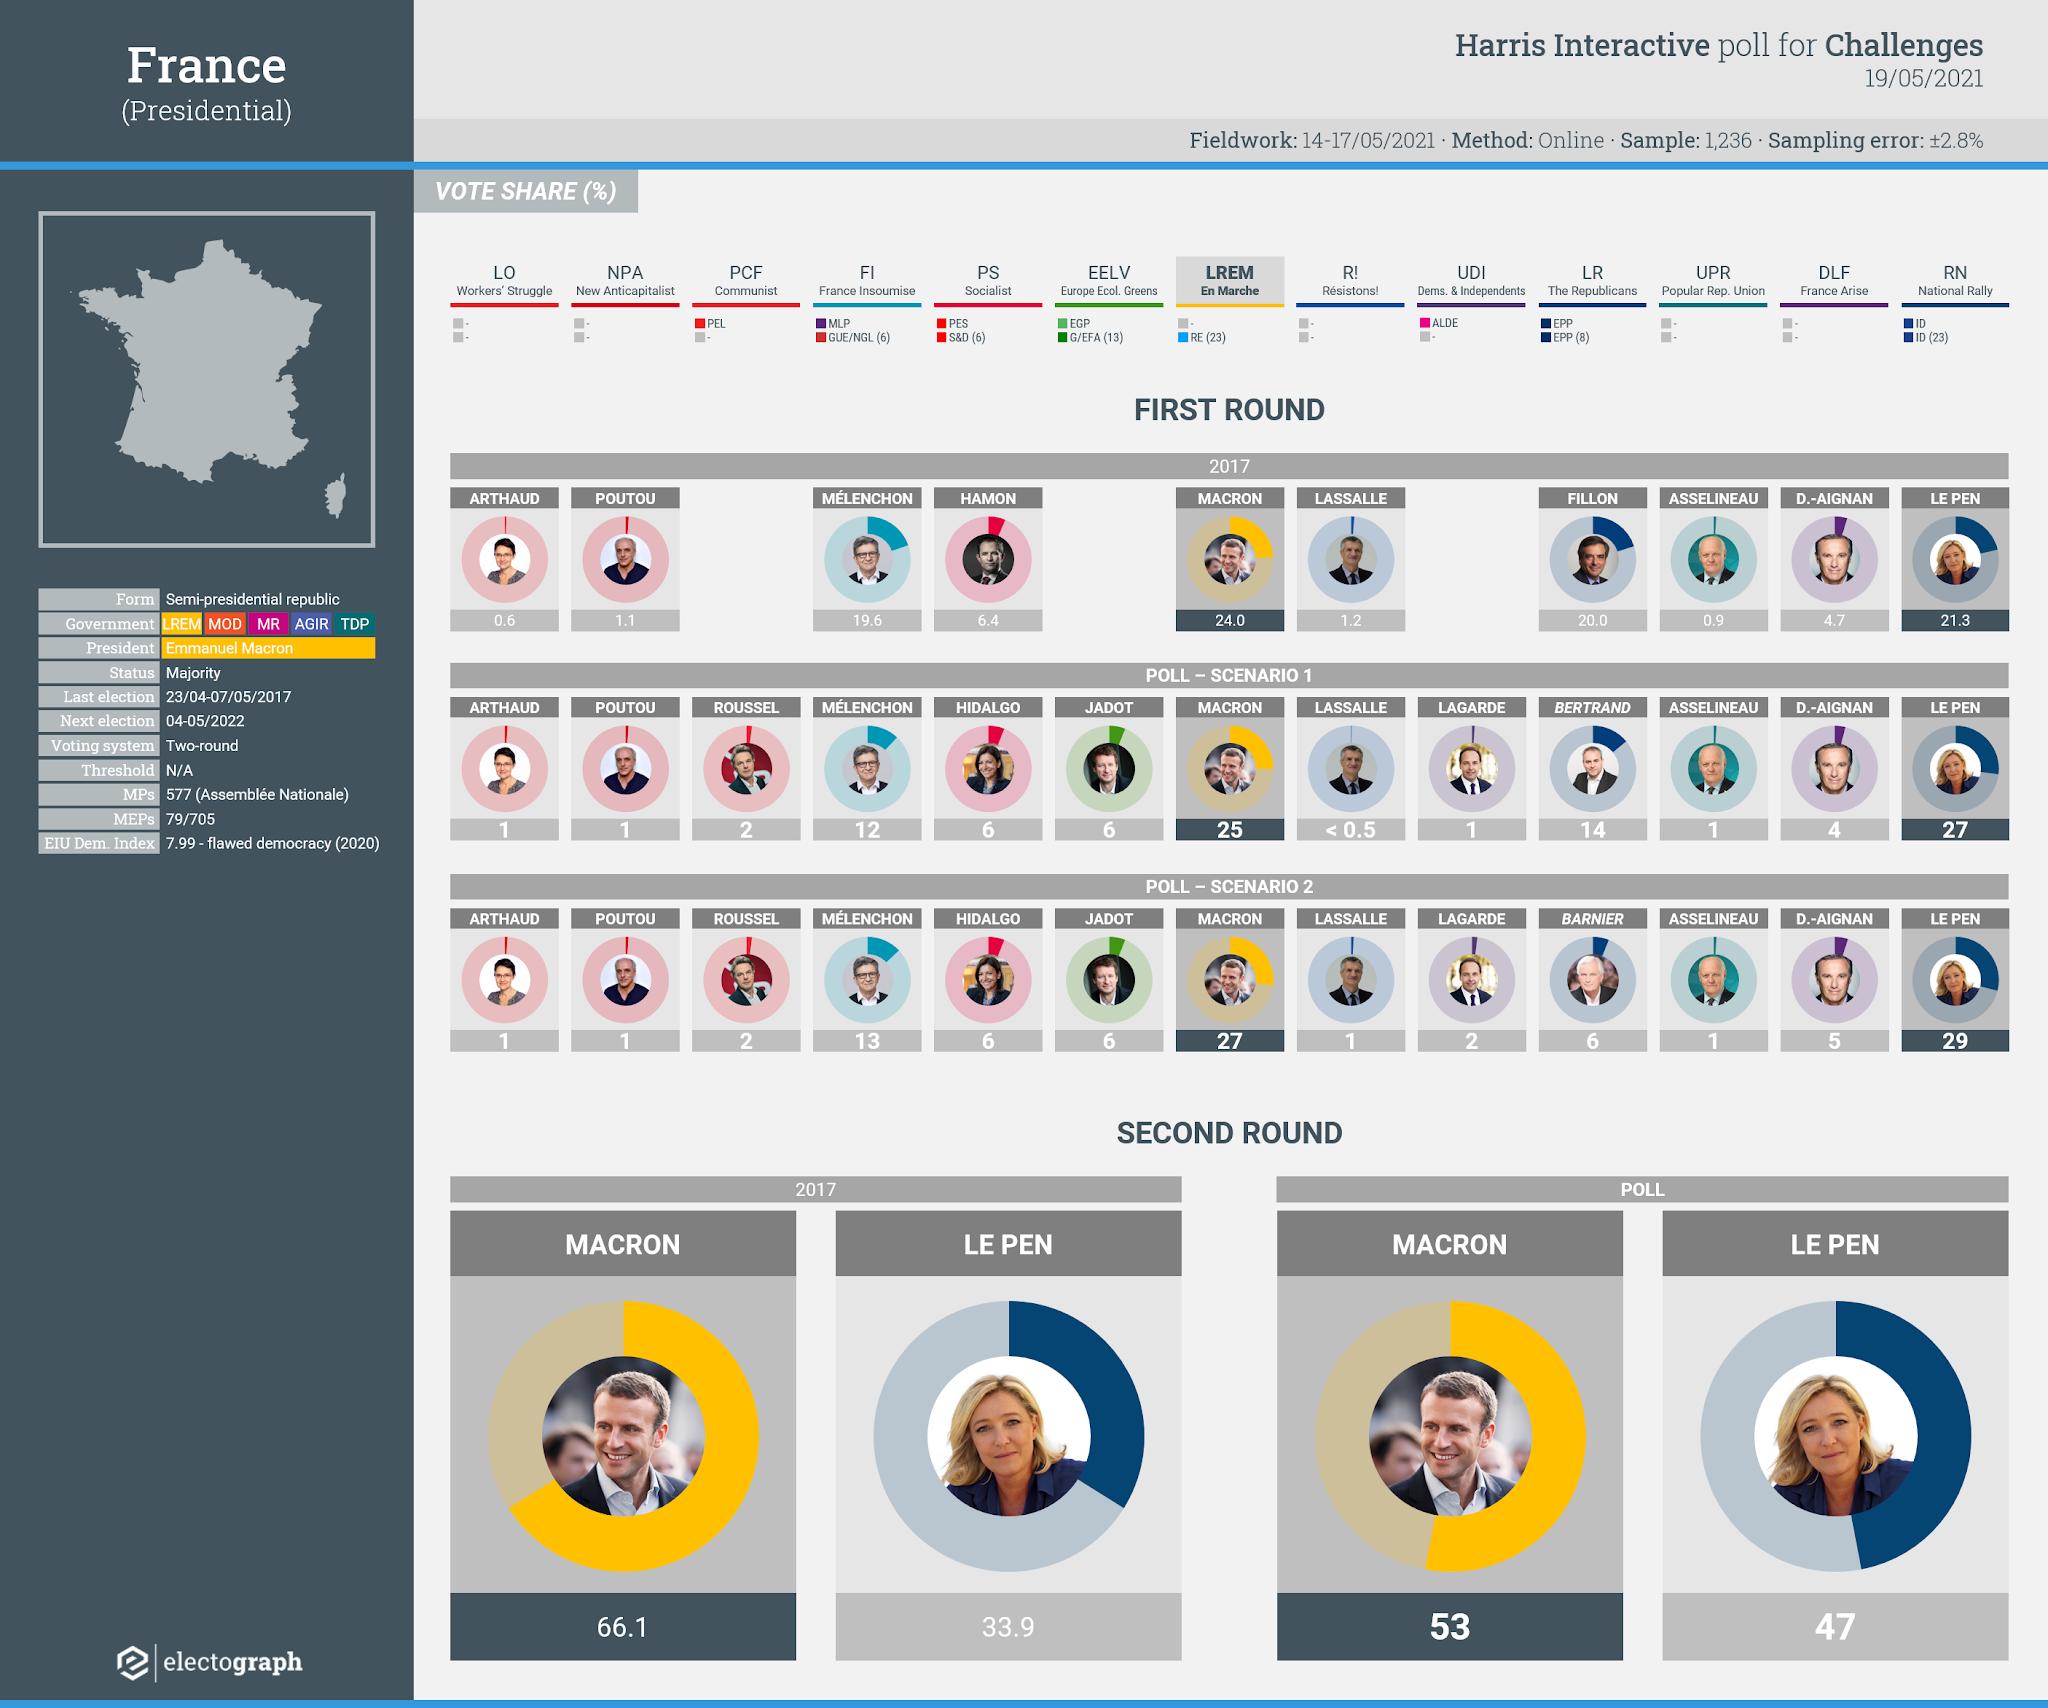 FRANCE: Harris Interactive poll chart, 19 May 2021